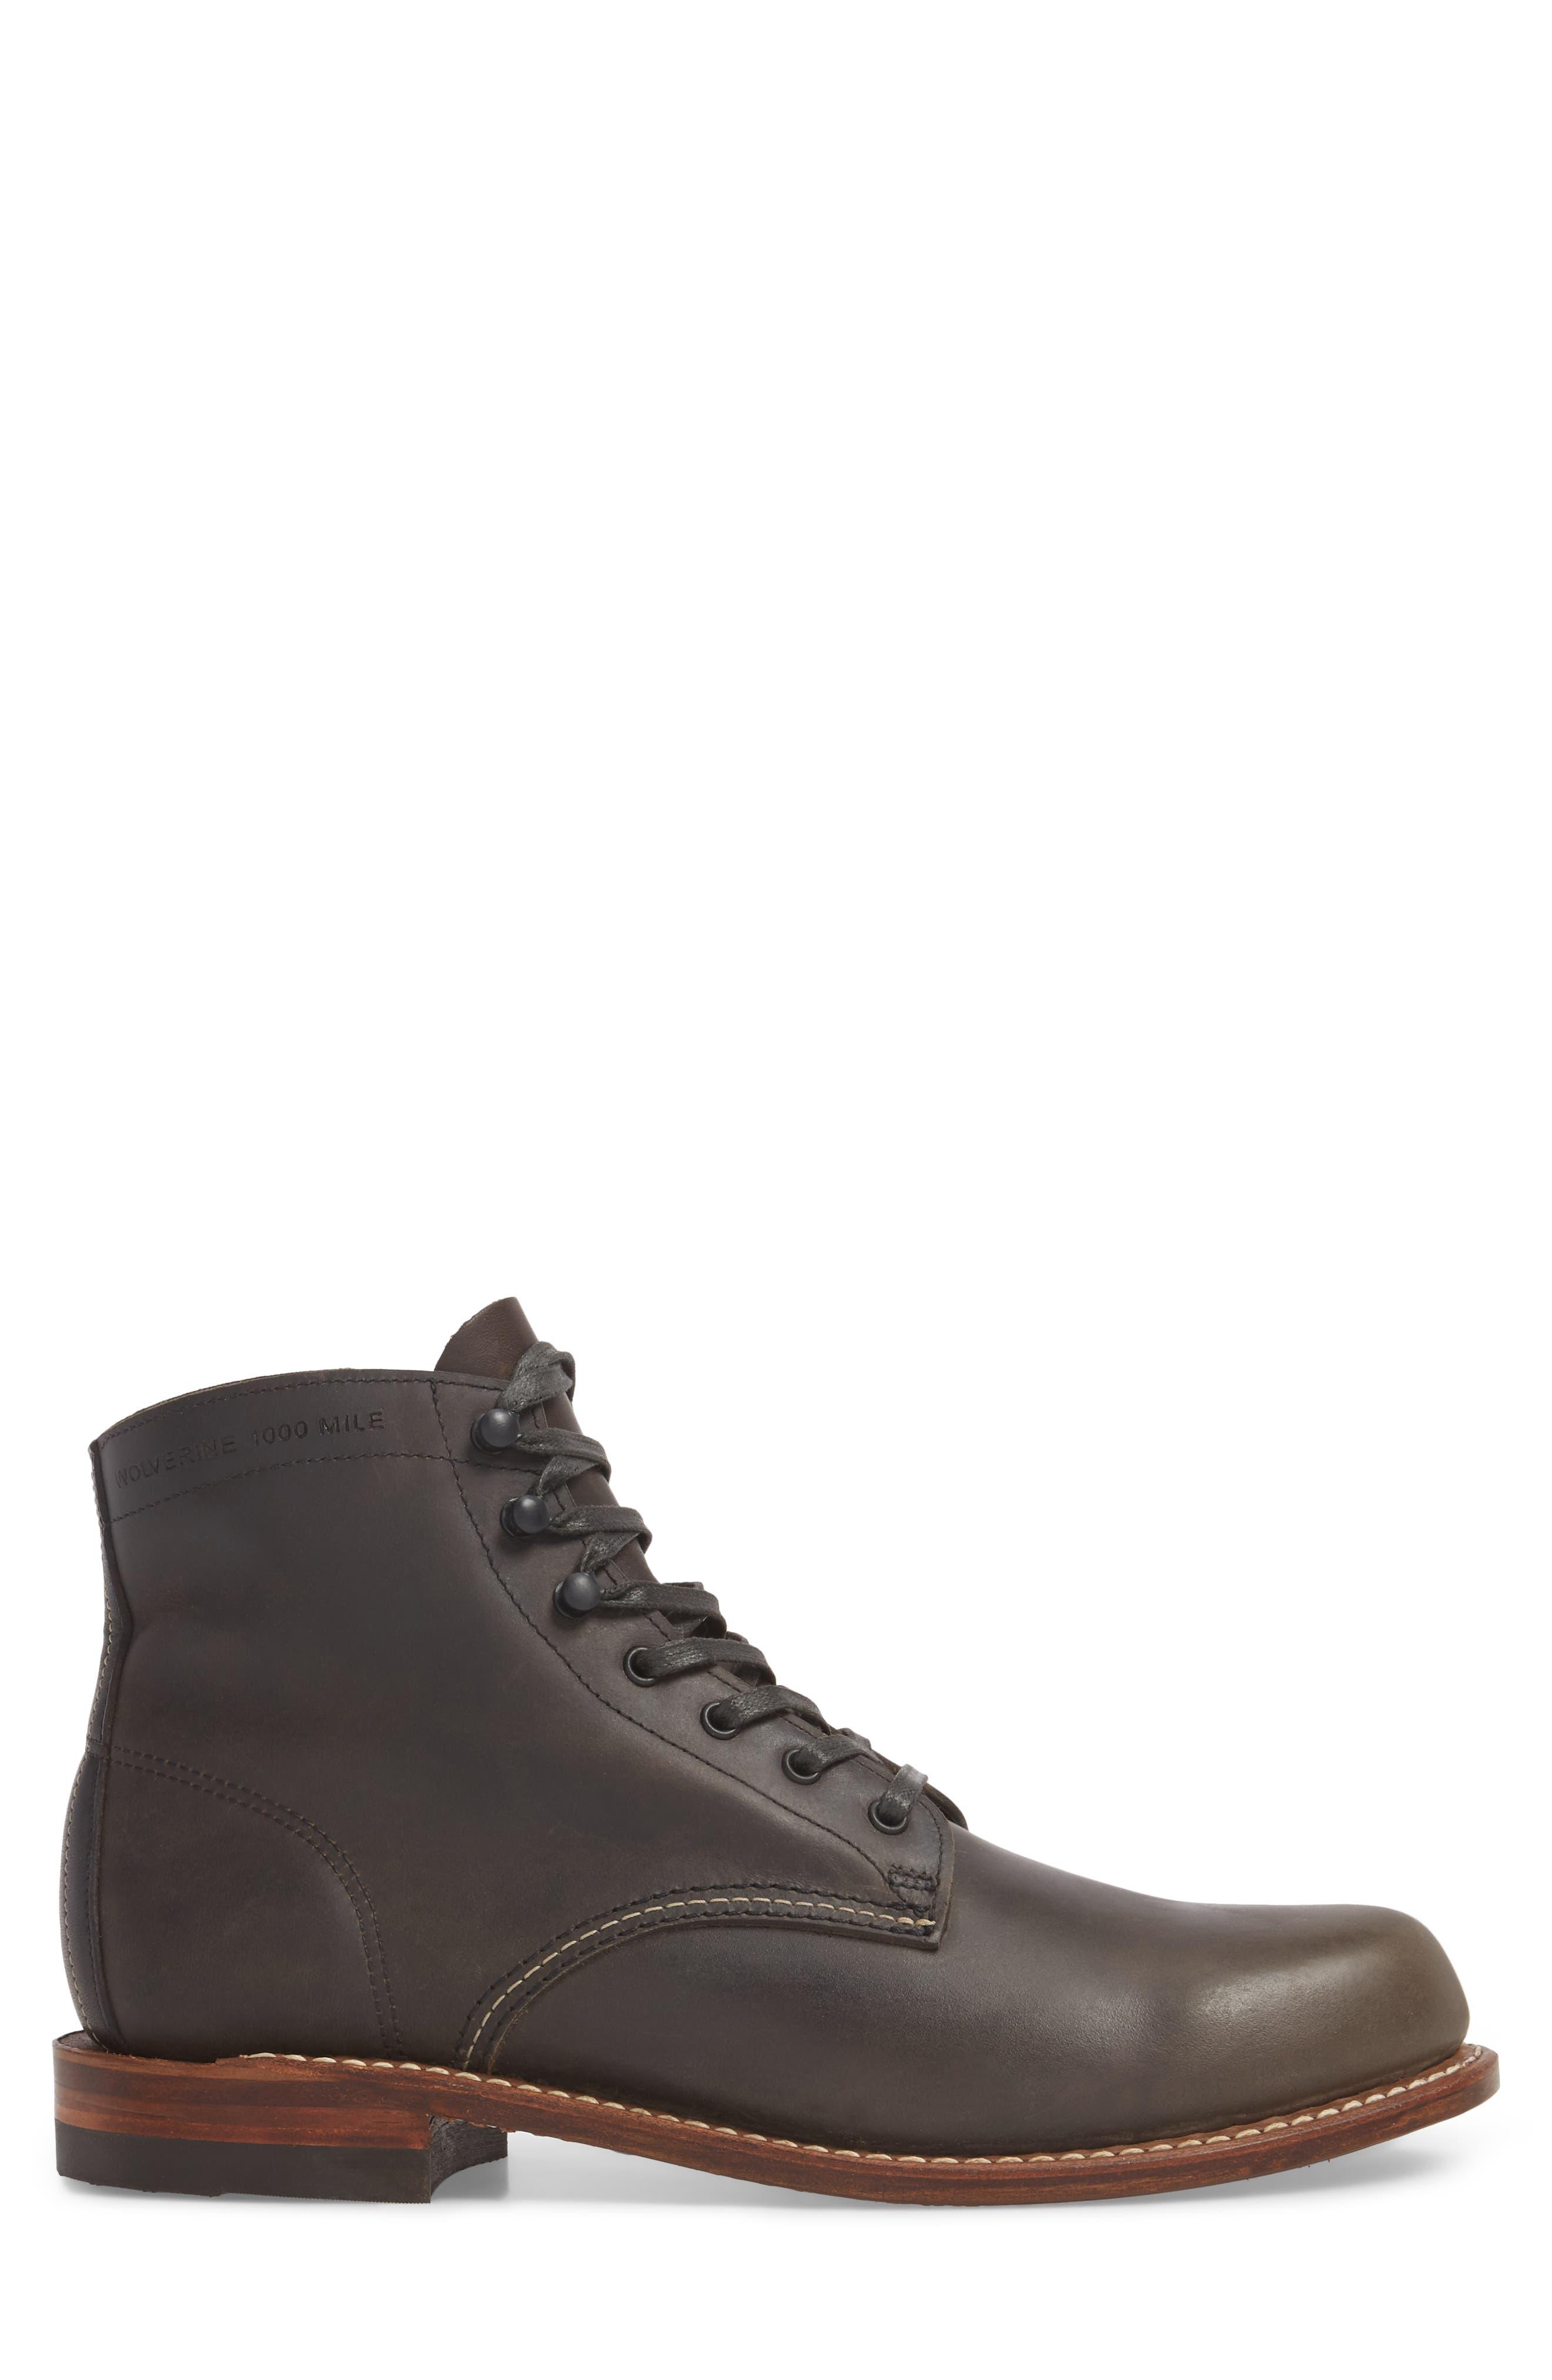 '1000 Mile' Plain Toe Boot,                             Alternate thumbnail 4, color,                             Charcoal